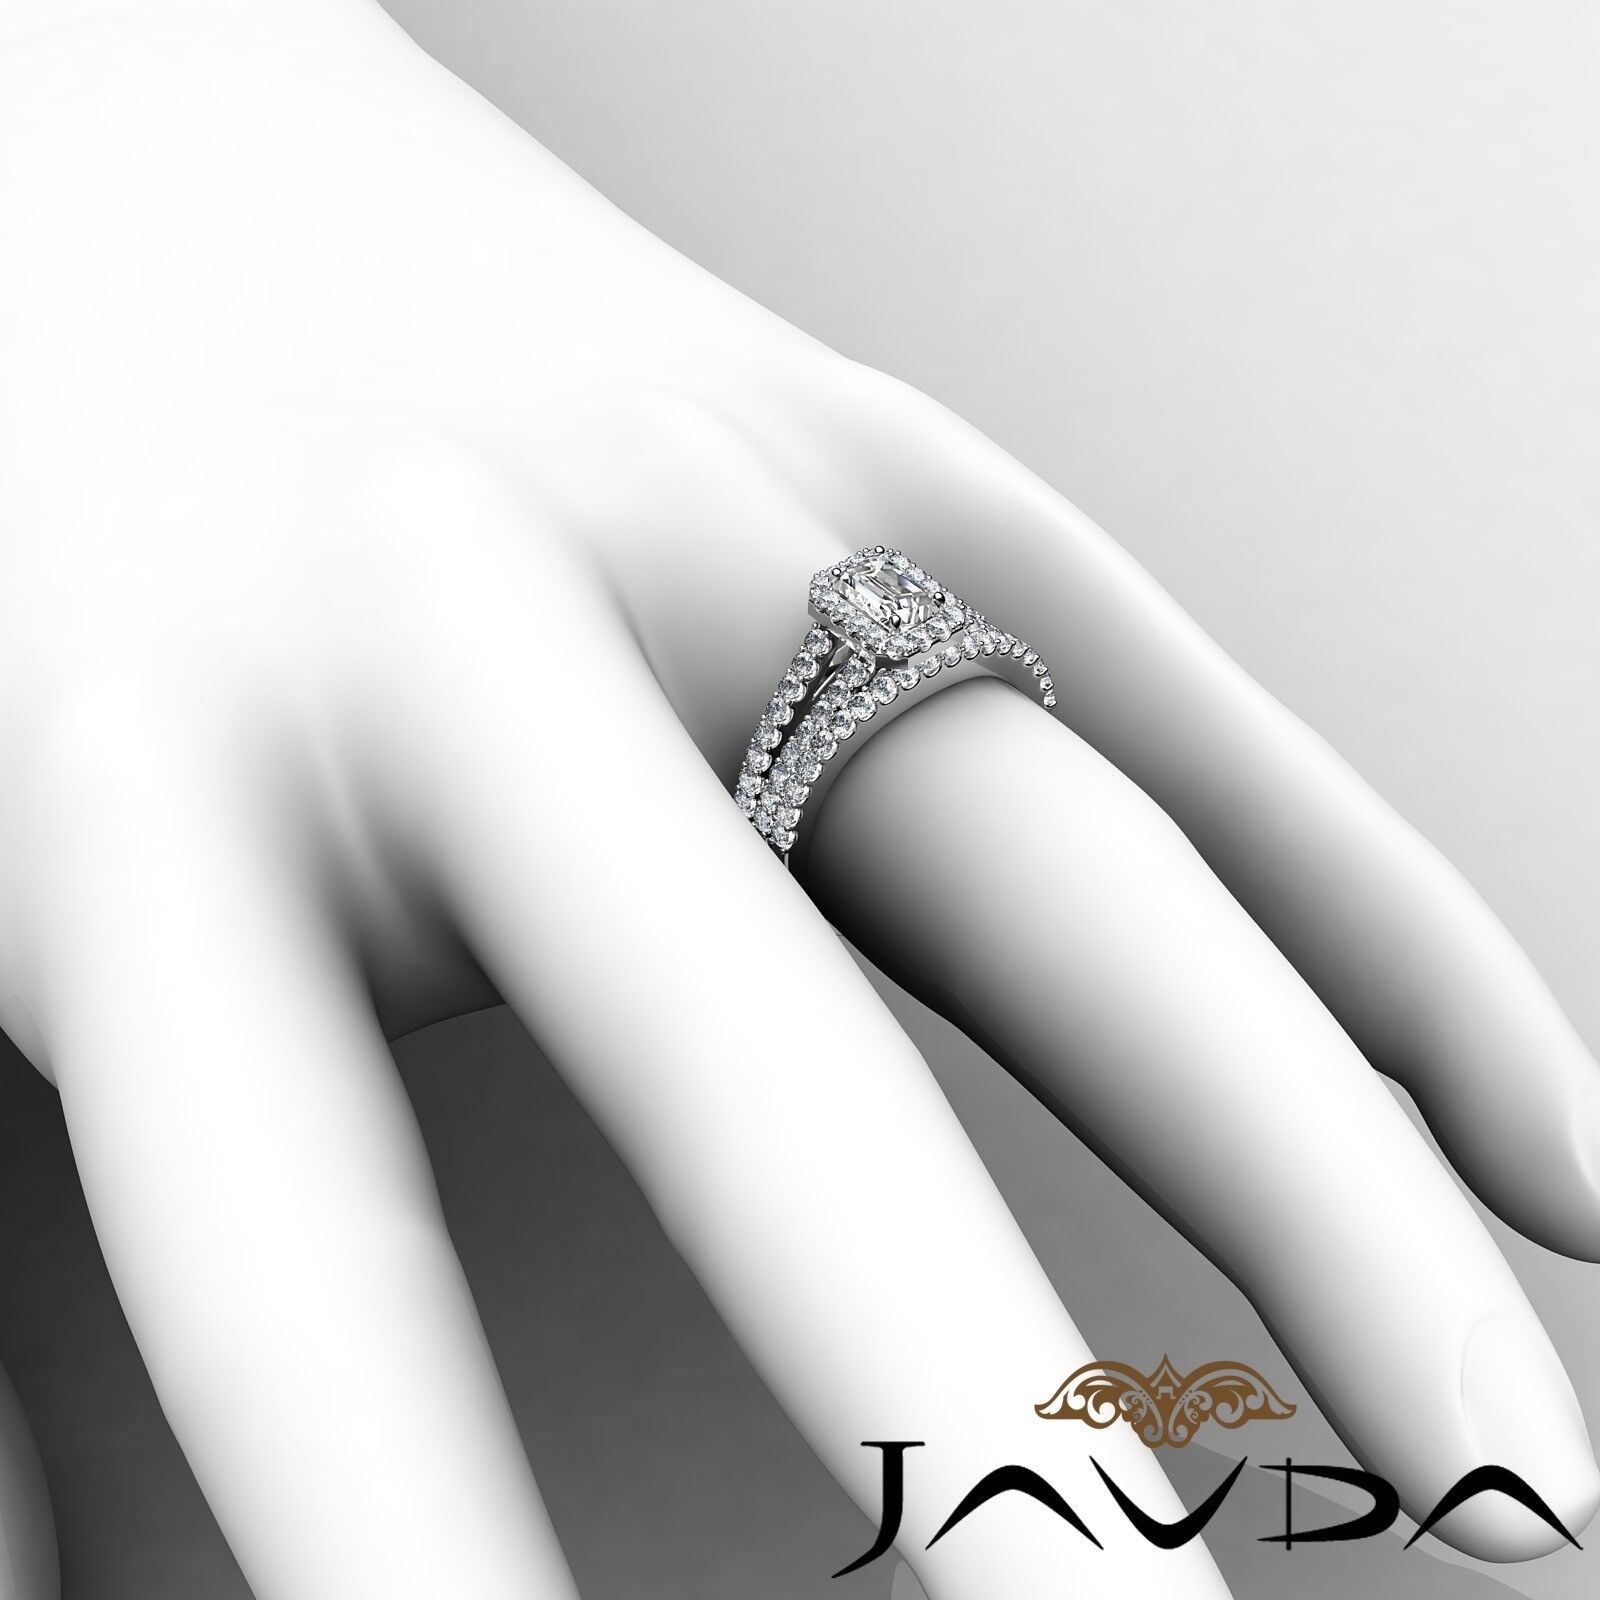 1.75ctw Halo Sidestone Bridal Emerald Diamond Engagement Ring GIA H-VS2 W Gold 6